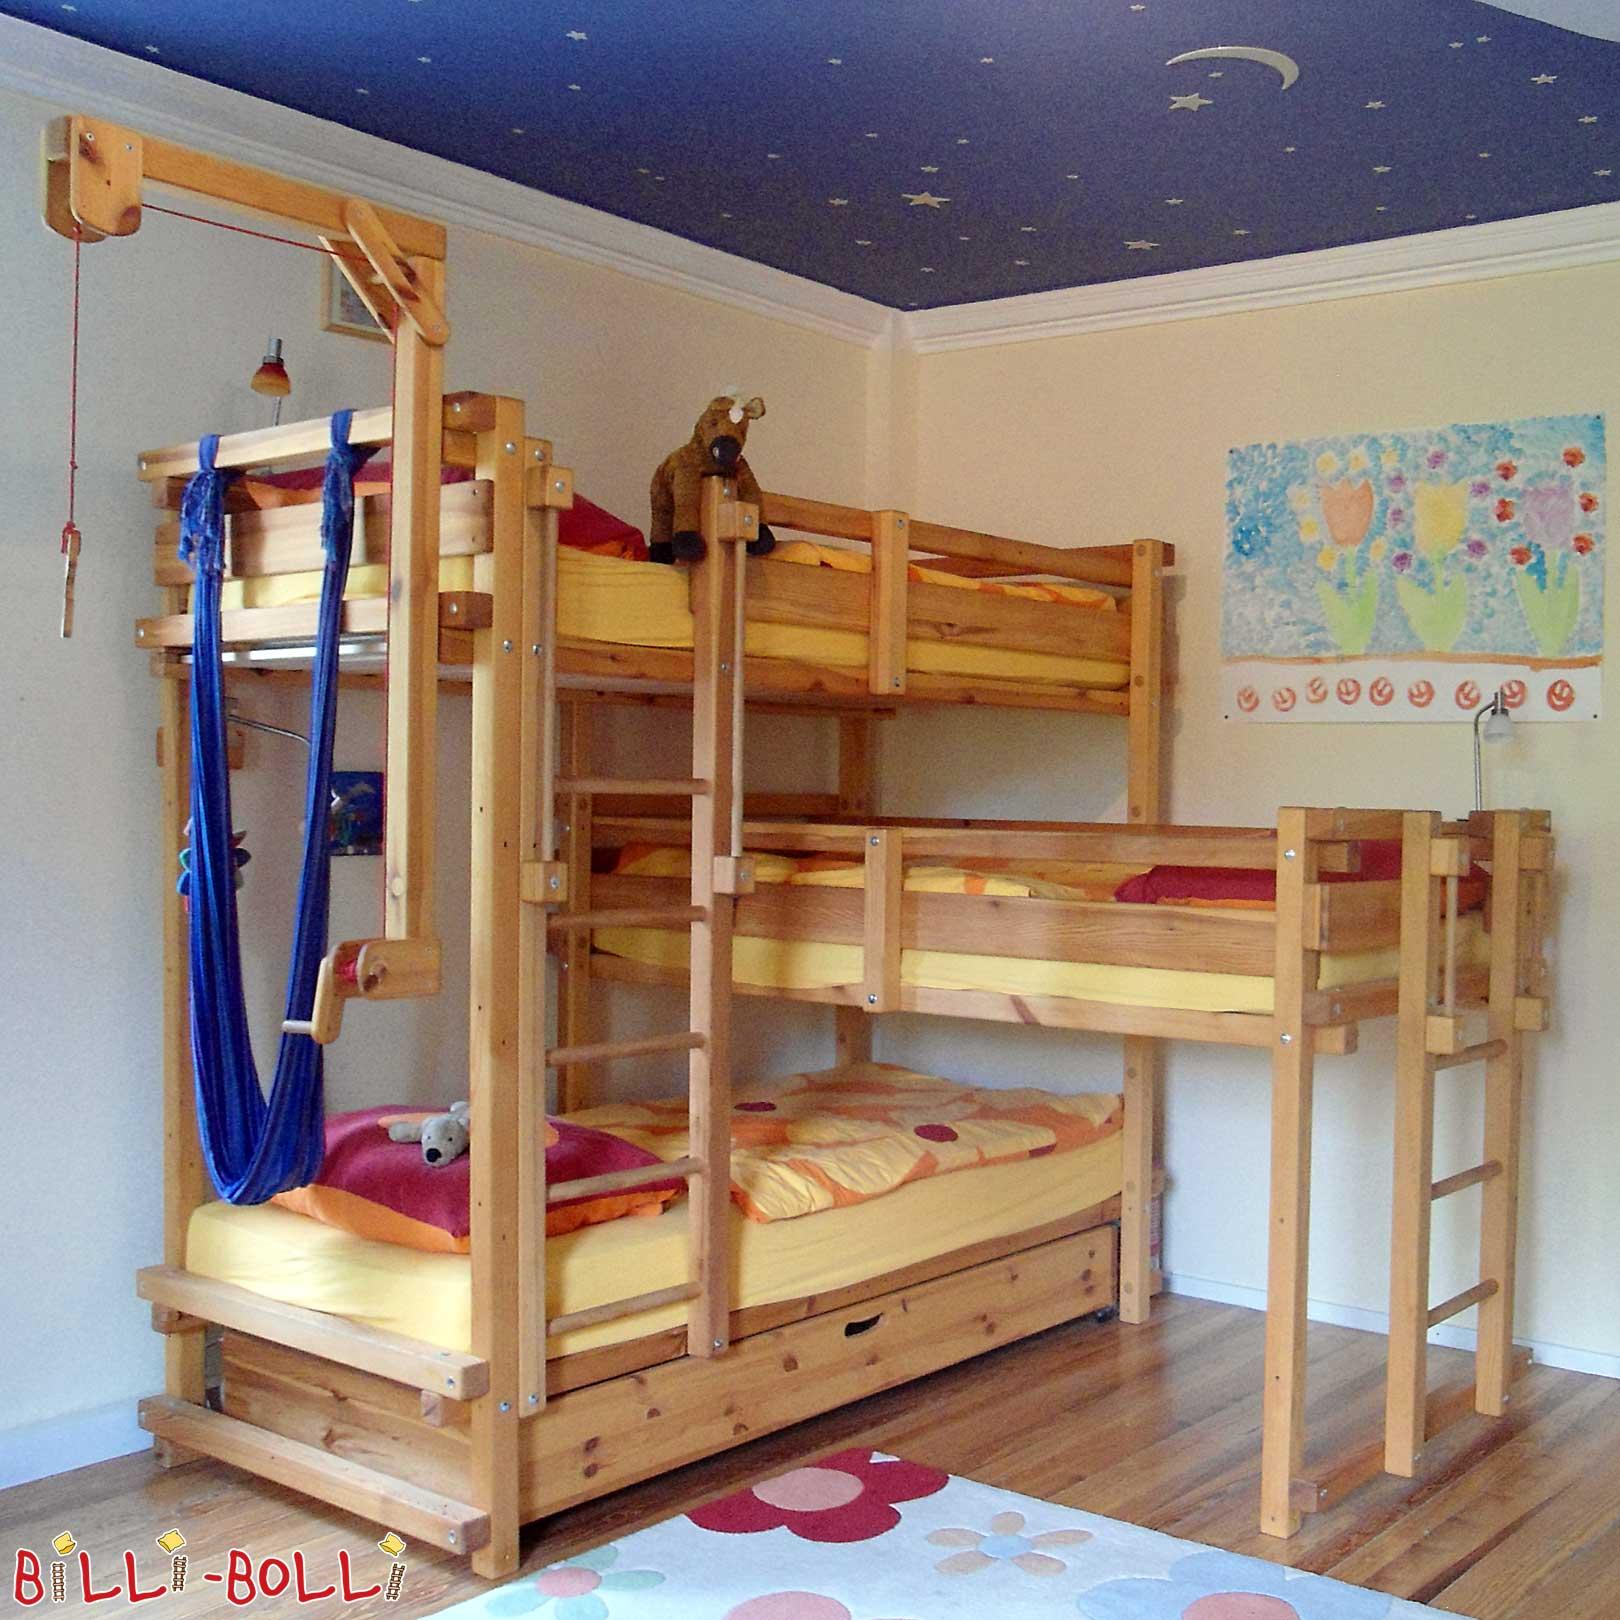 Dreier Betten Billi Bolli Kindermobel